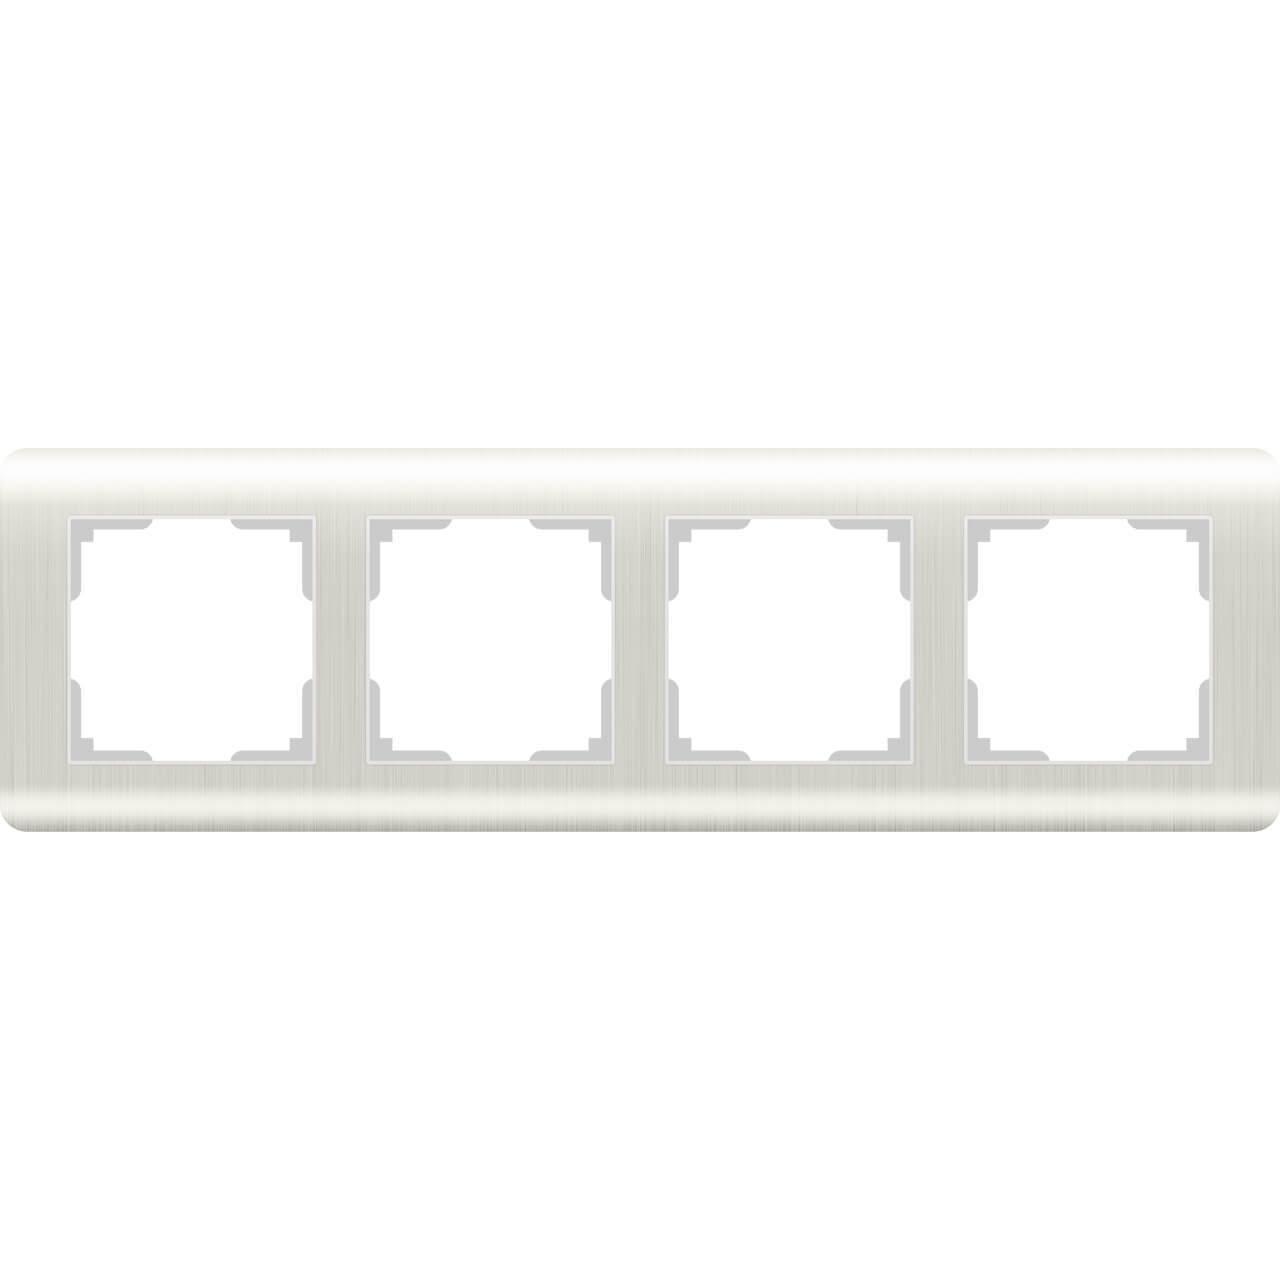 цена Рамка Stream на 4 поста перламутровый WL12-Frame-04 4690389123030 онлайн в 2017 году